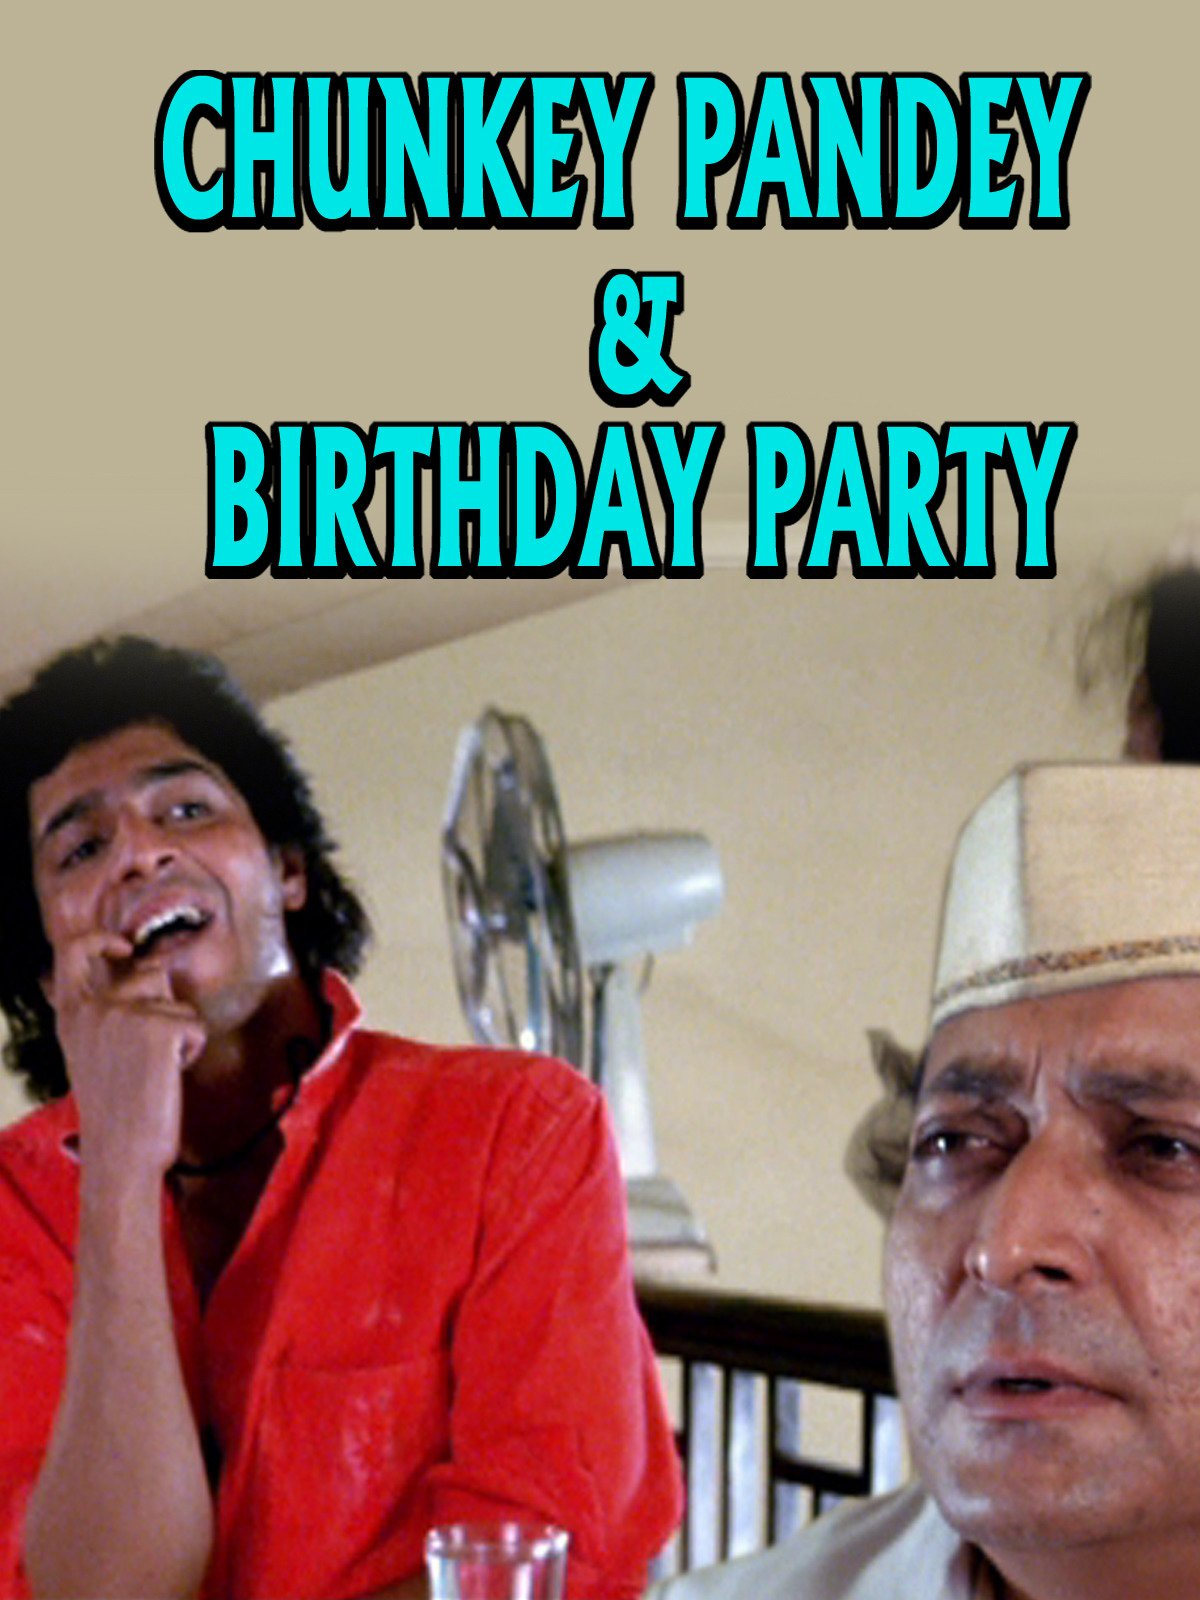 Clip: Chunkey Pandey & Birthday Party